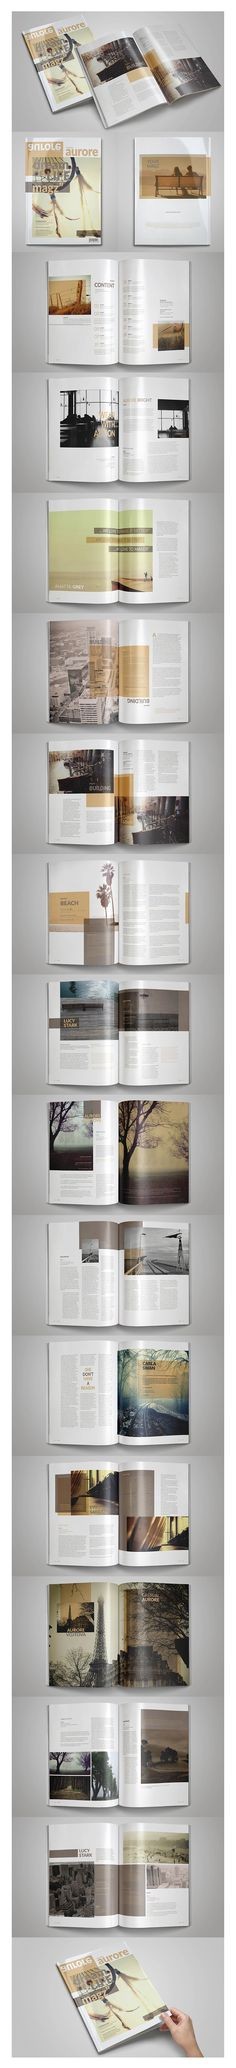 free Indesign Magazine Template